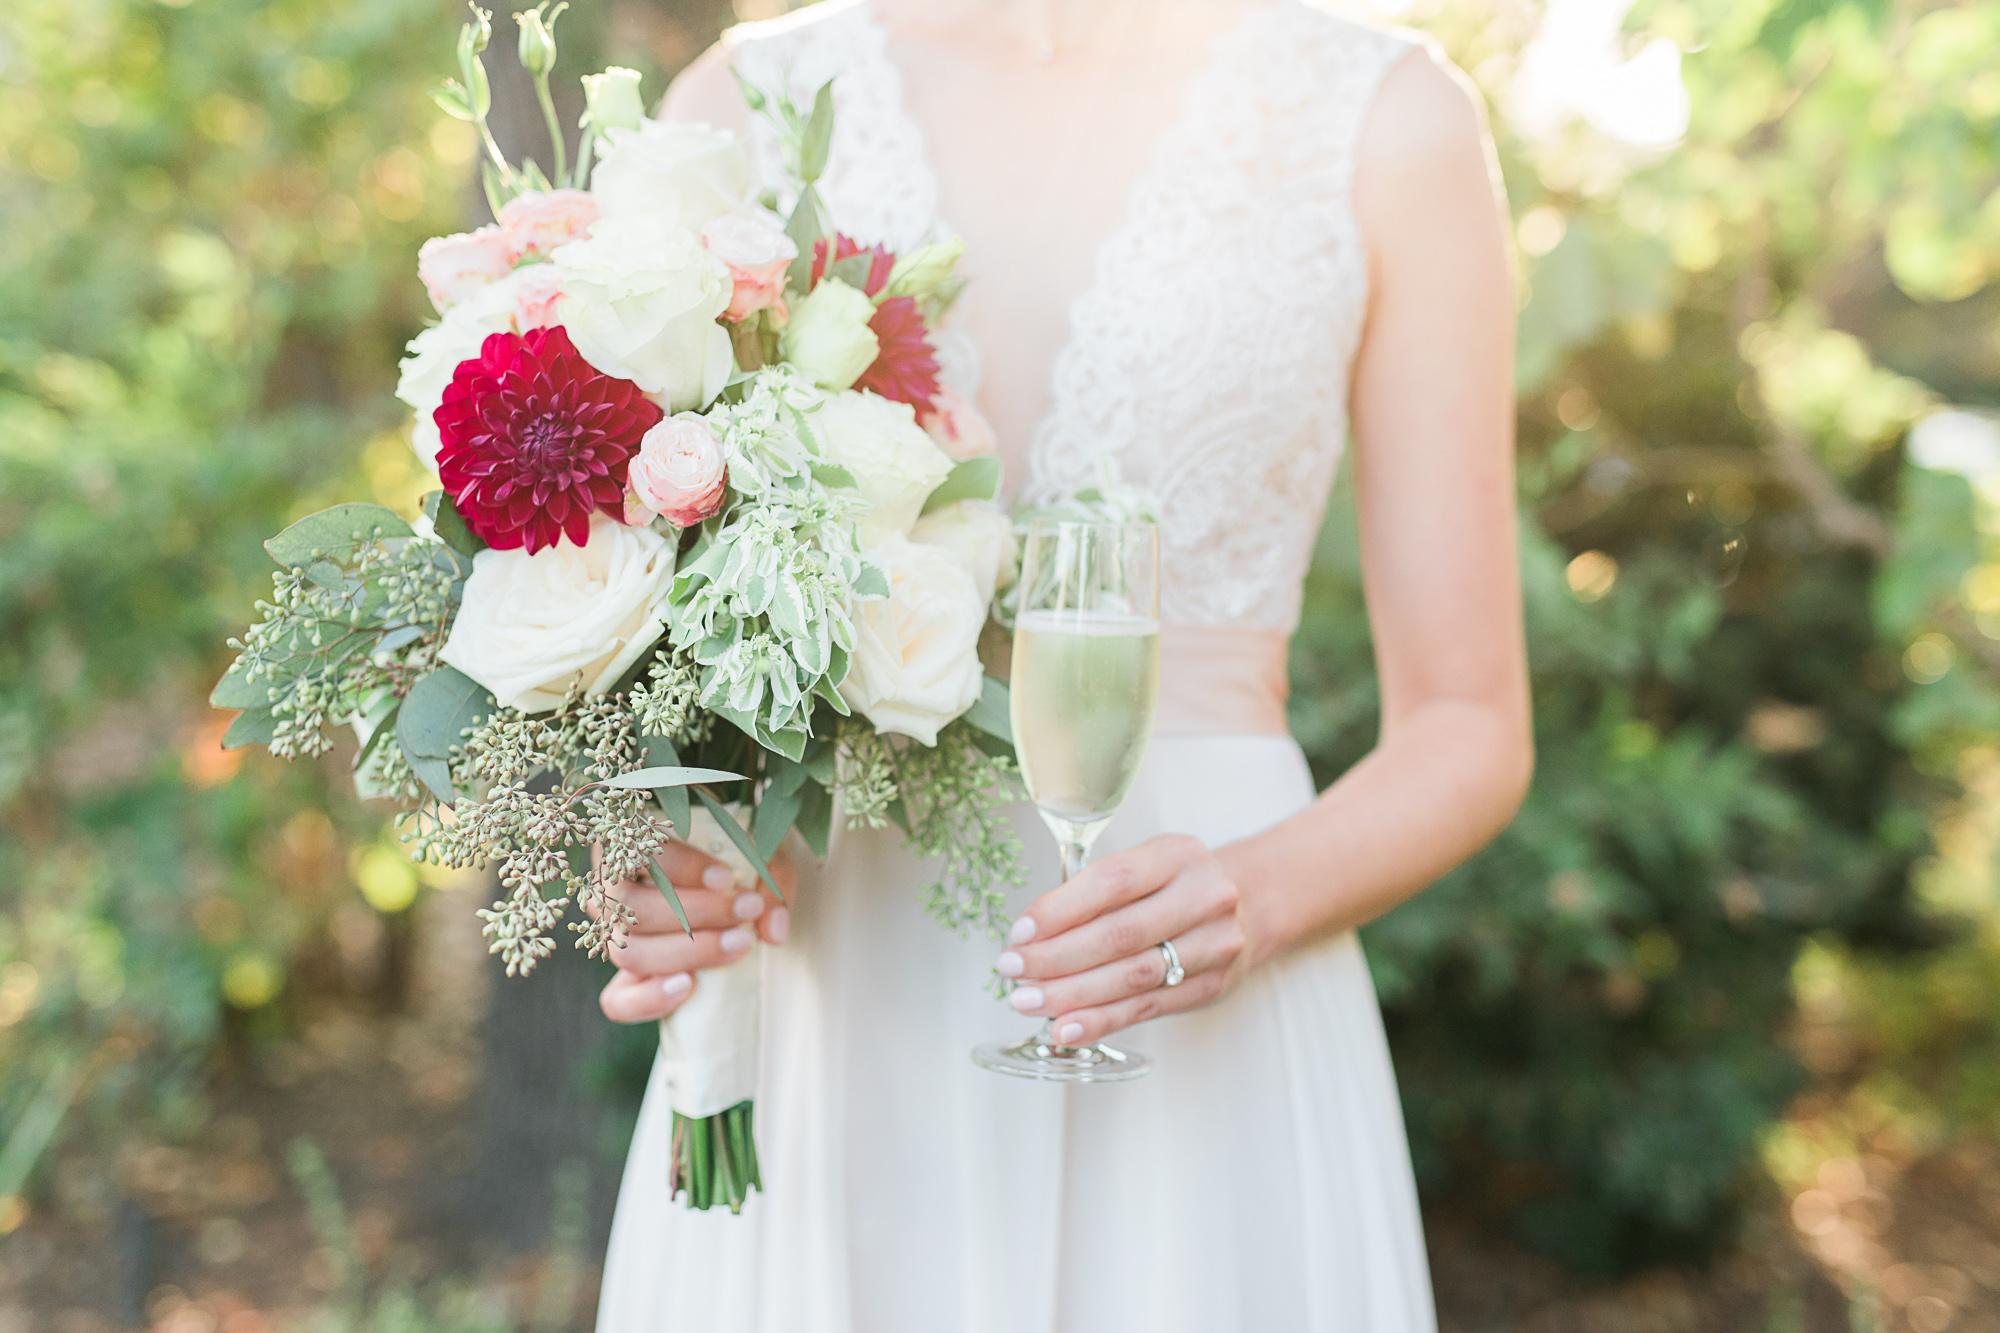 Generals Daughter Wedding Photos by JBJ Pictures - Ramekins Wedding Venue Photographer in Sonoma, Napa (31).jpg